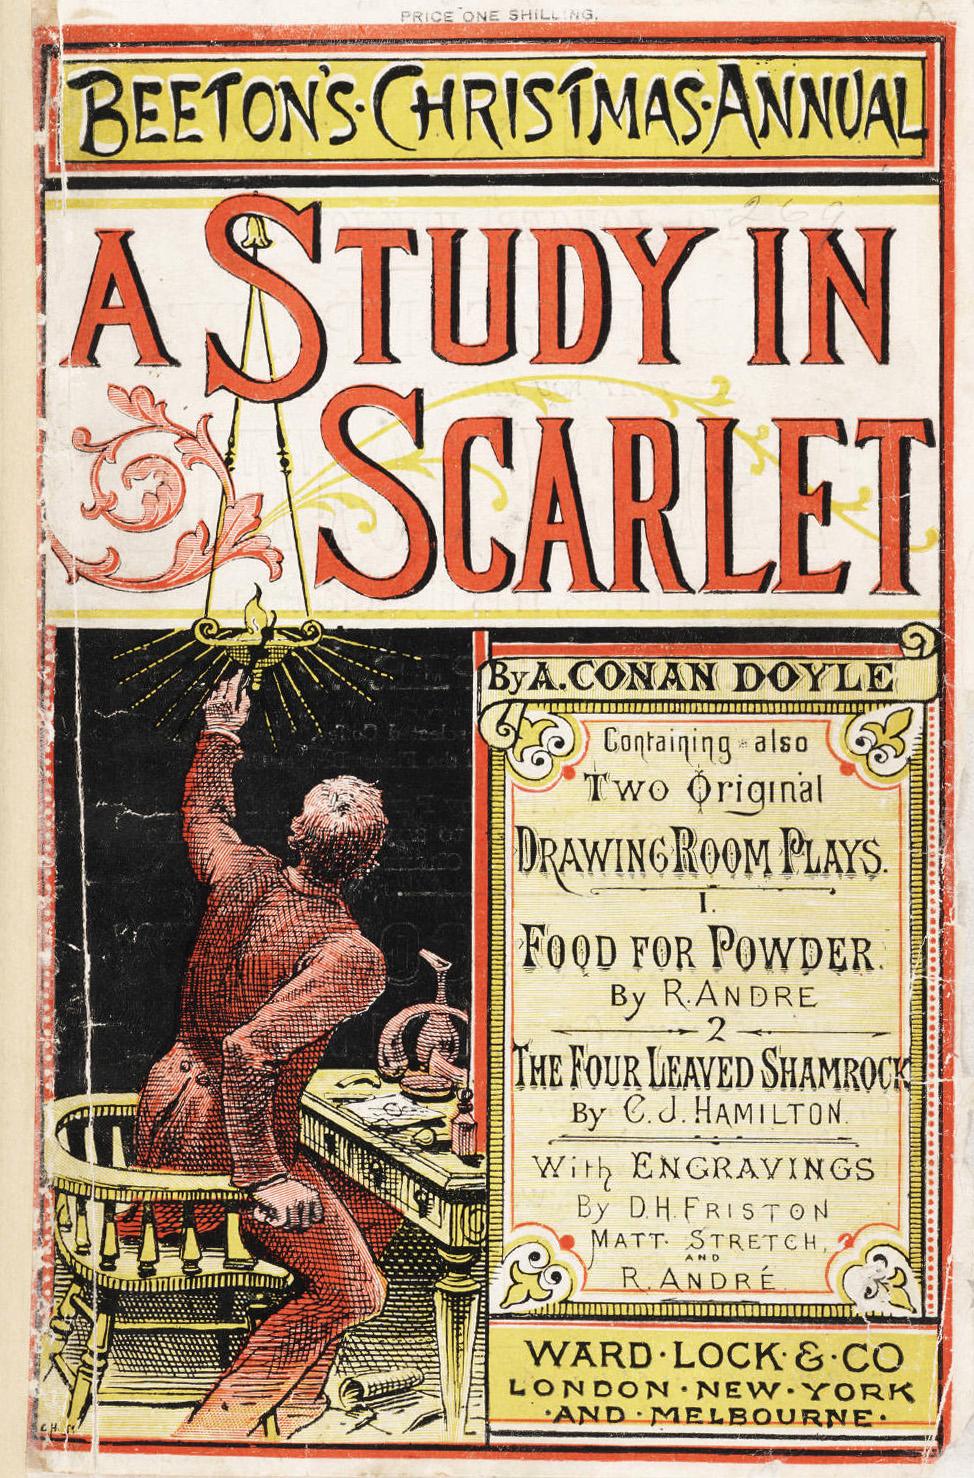 a study in scarlet.jpg